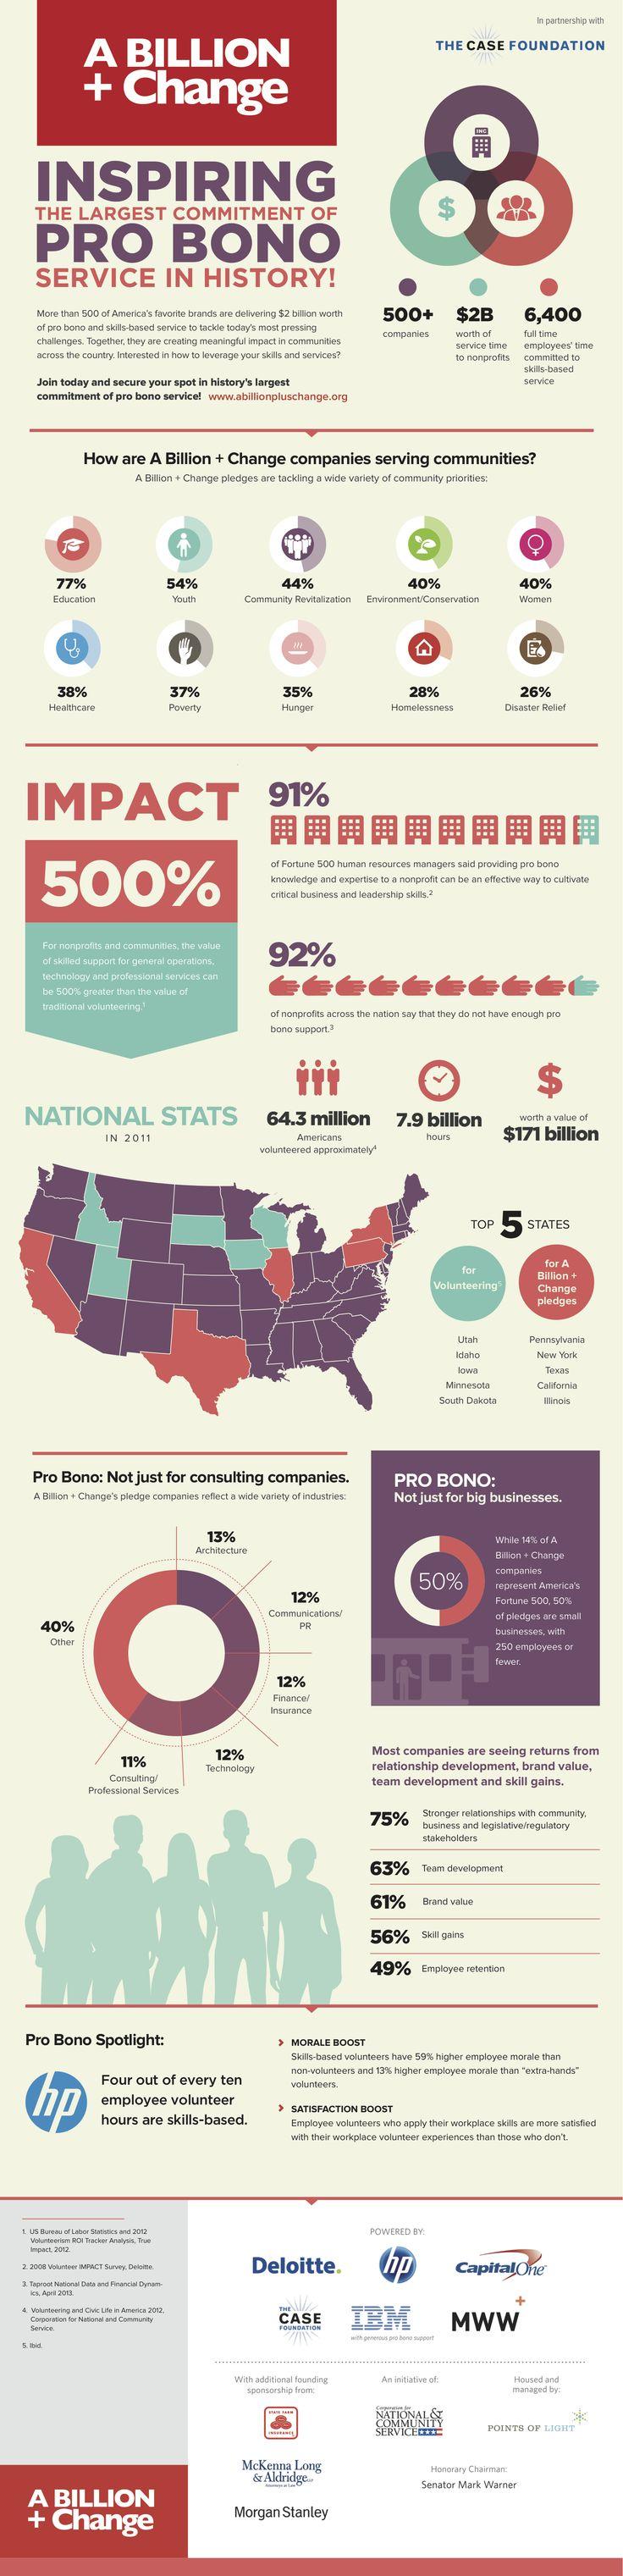 Pro Bono Week Infographic with A Billion + Change